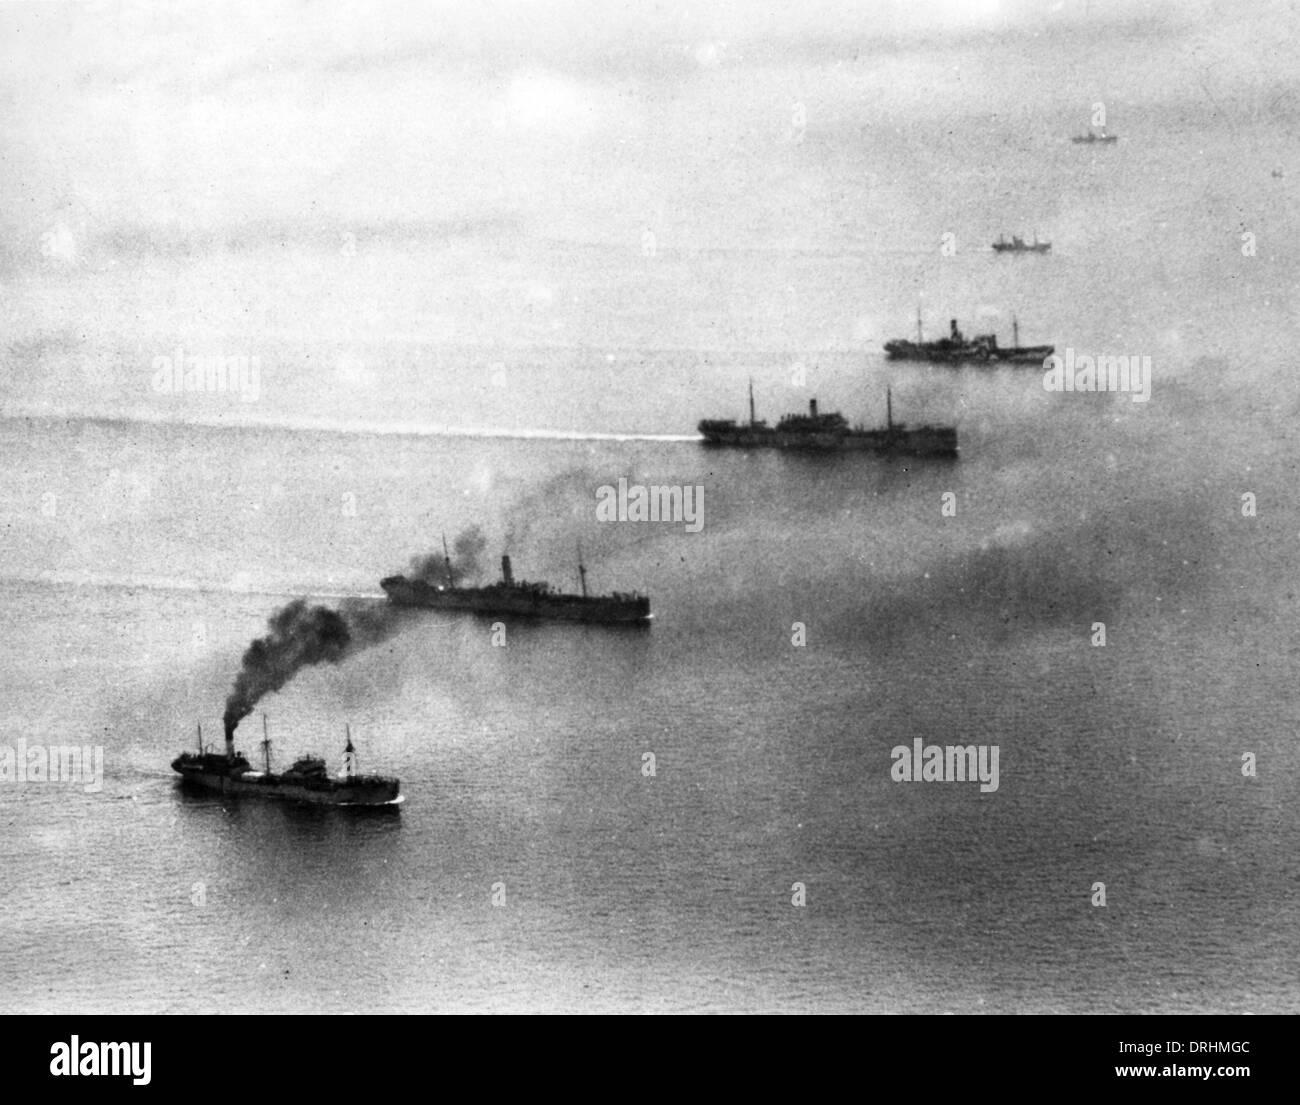 Convoy of British ships, WW1 - Stock Image